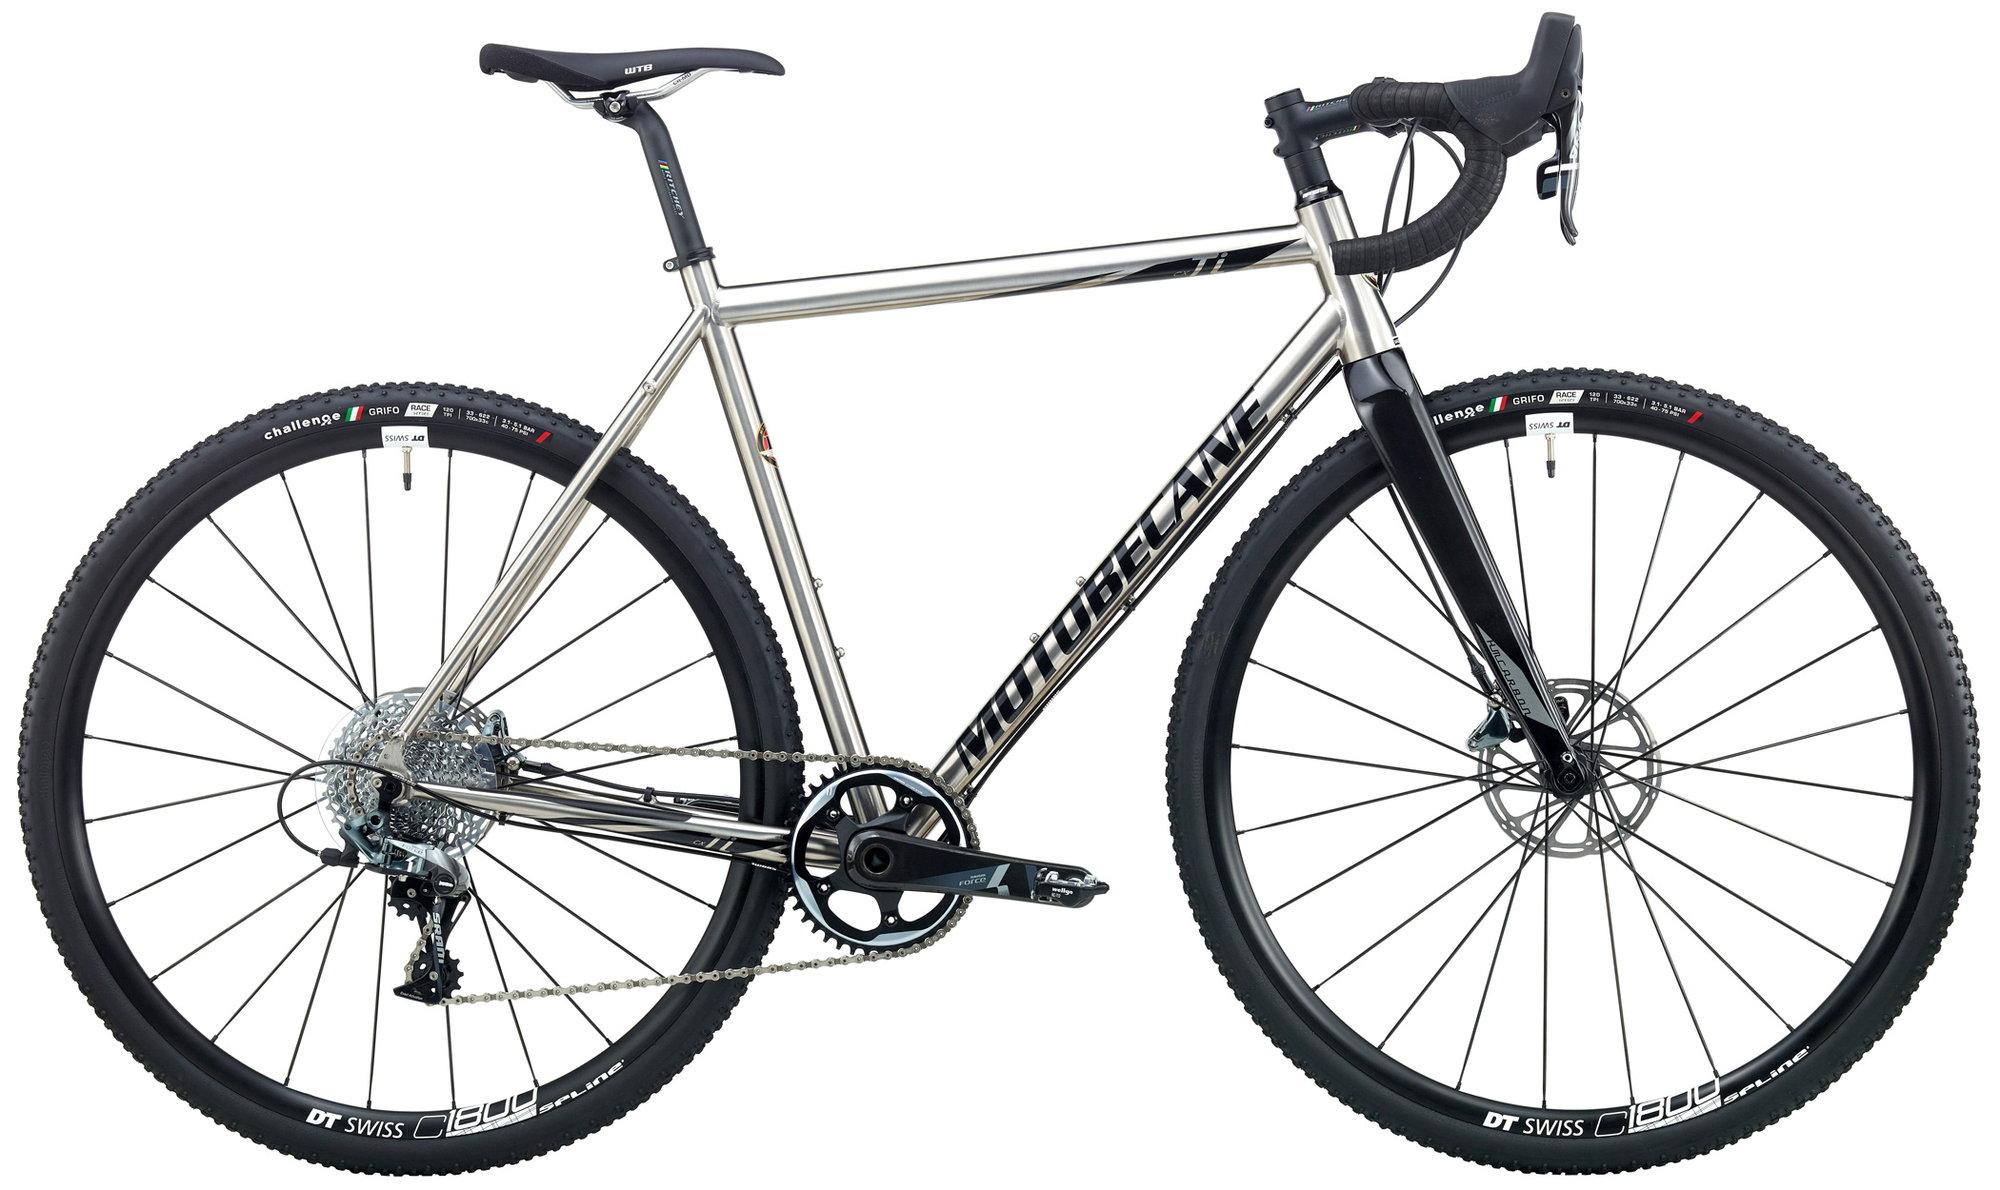 0f383868a16 853. Al. Save Up to 60% Off Disc Brake CycloCross Cross CX Bikes -  Motobecane ...